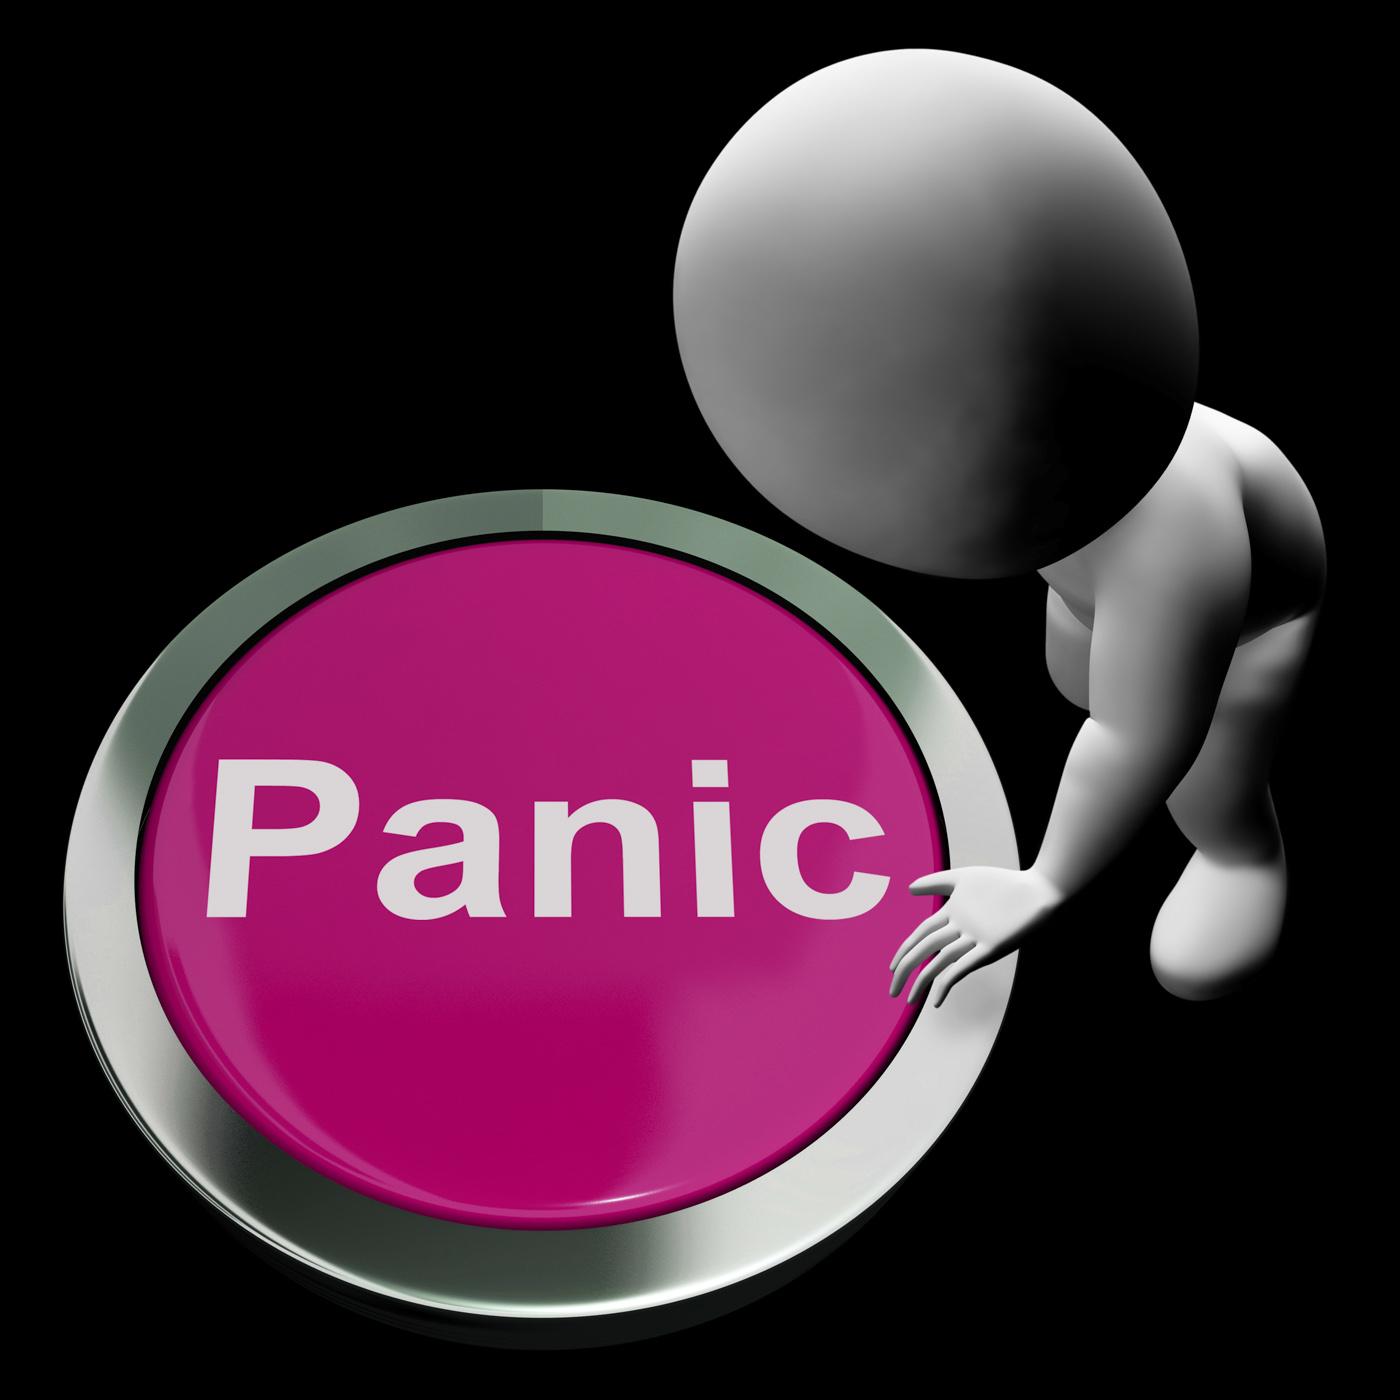 Panic button shows alarm distress and crisis photo